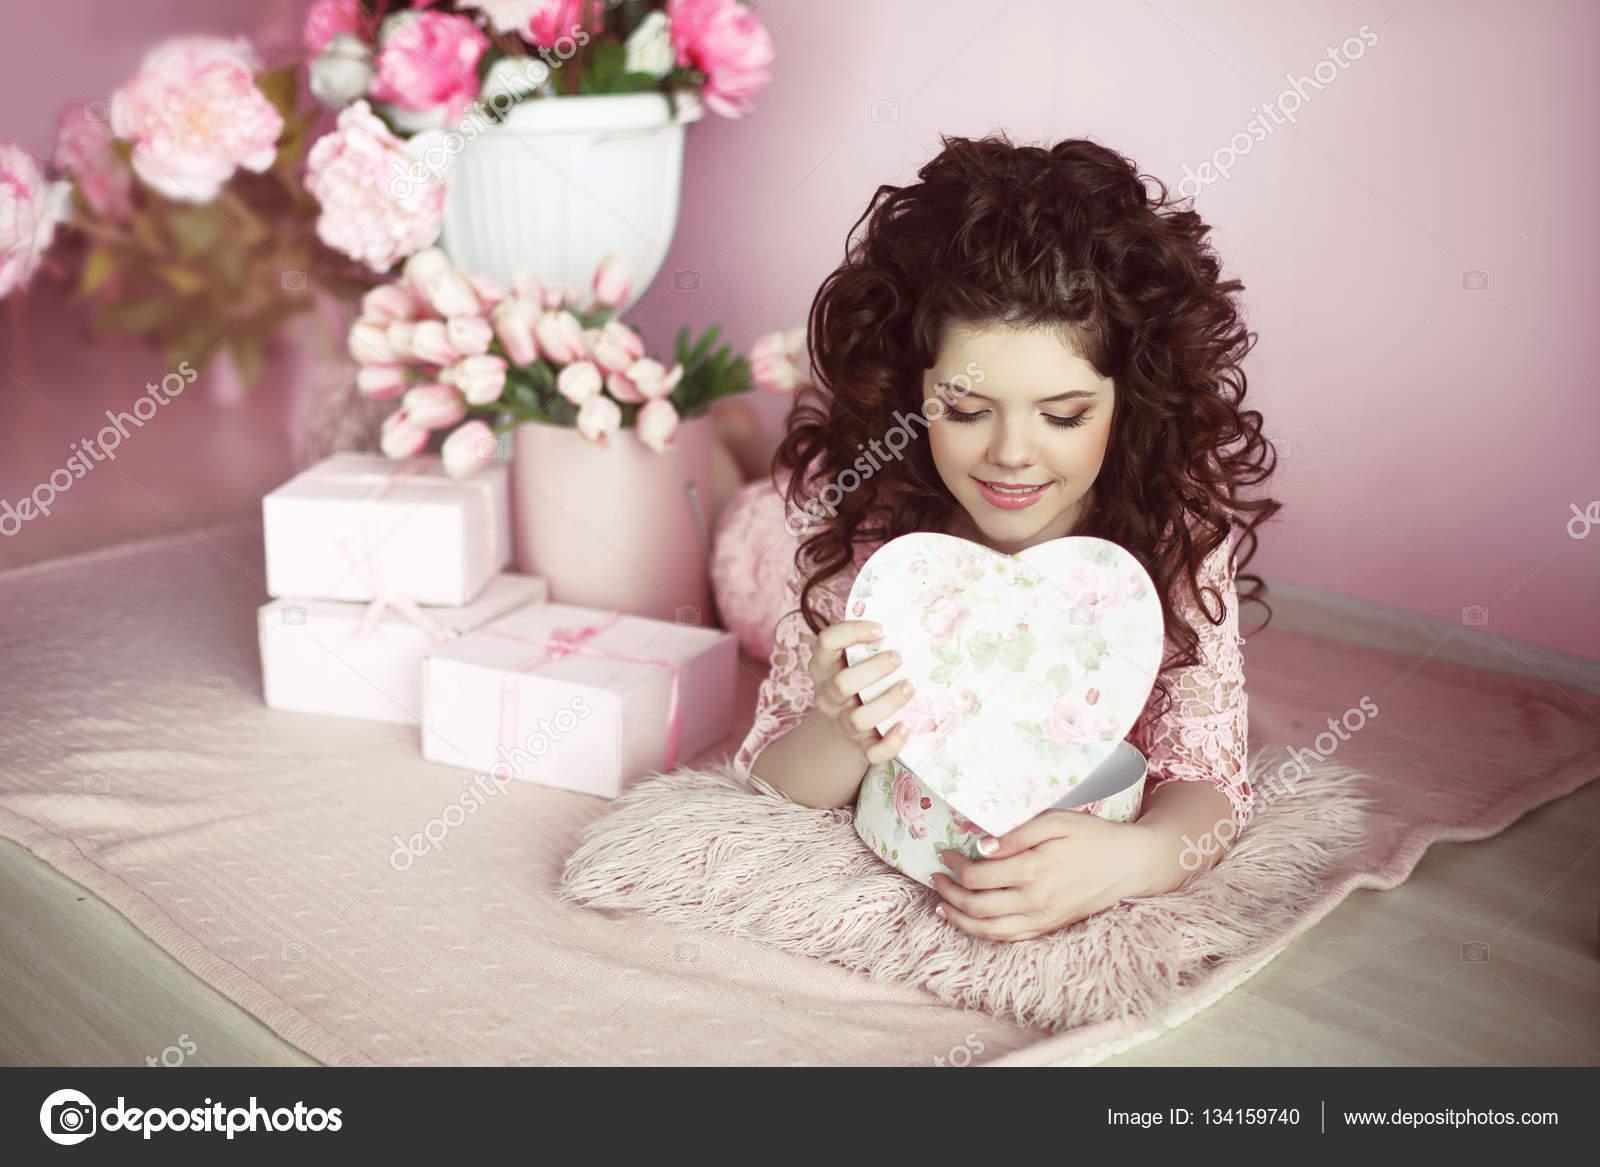 Романтическое фото девушки брюнетки